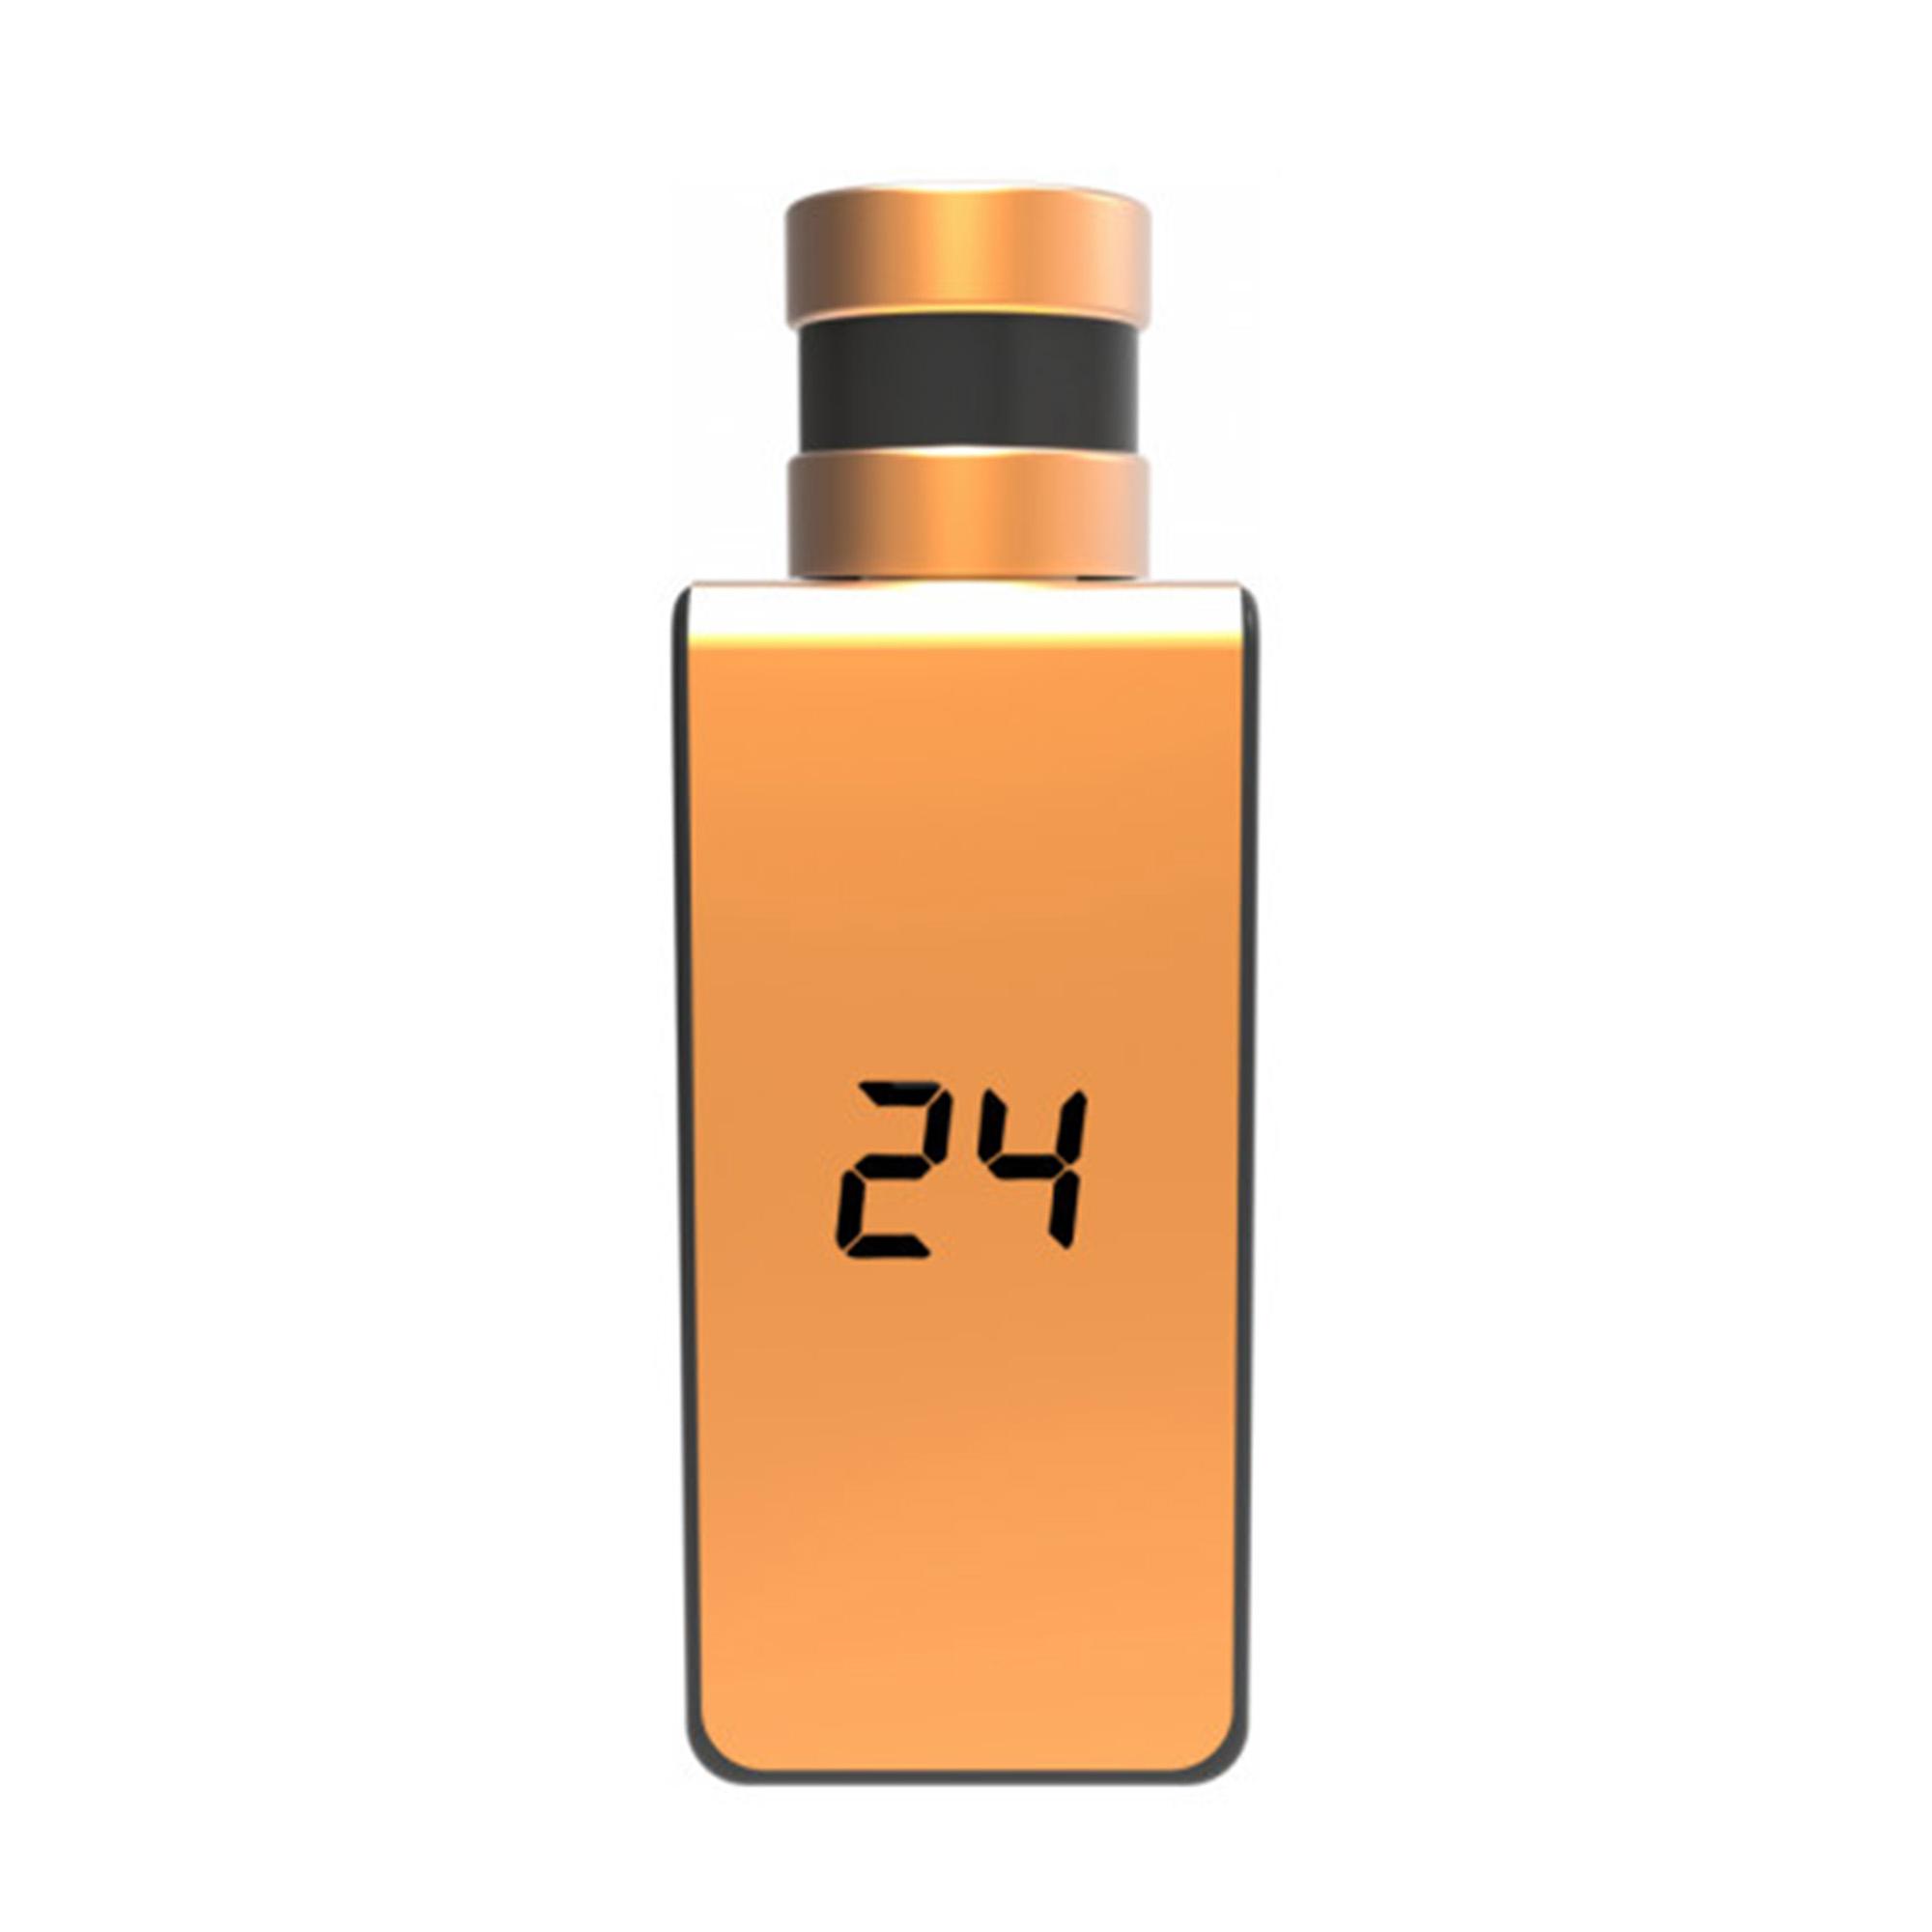 24 Elixir Rise Of The Superb Orange Edp 100ml